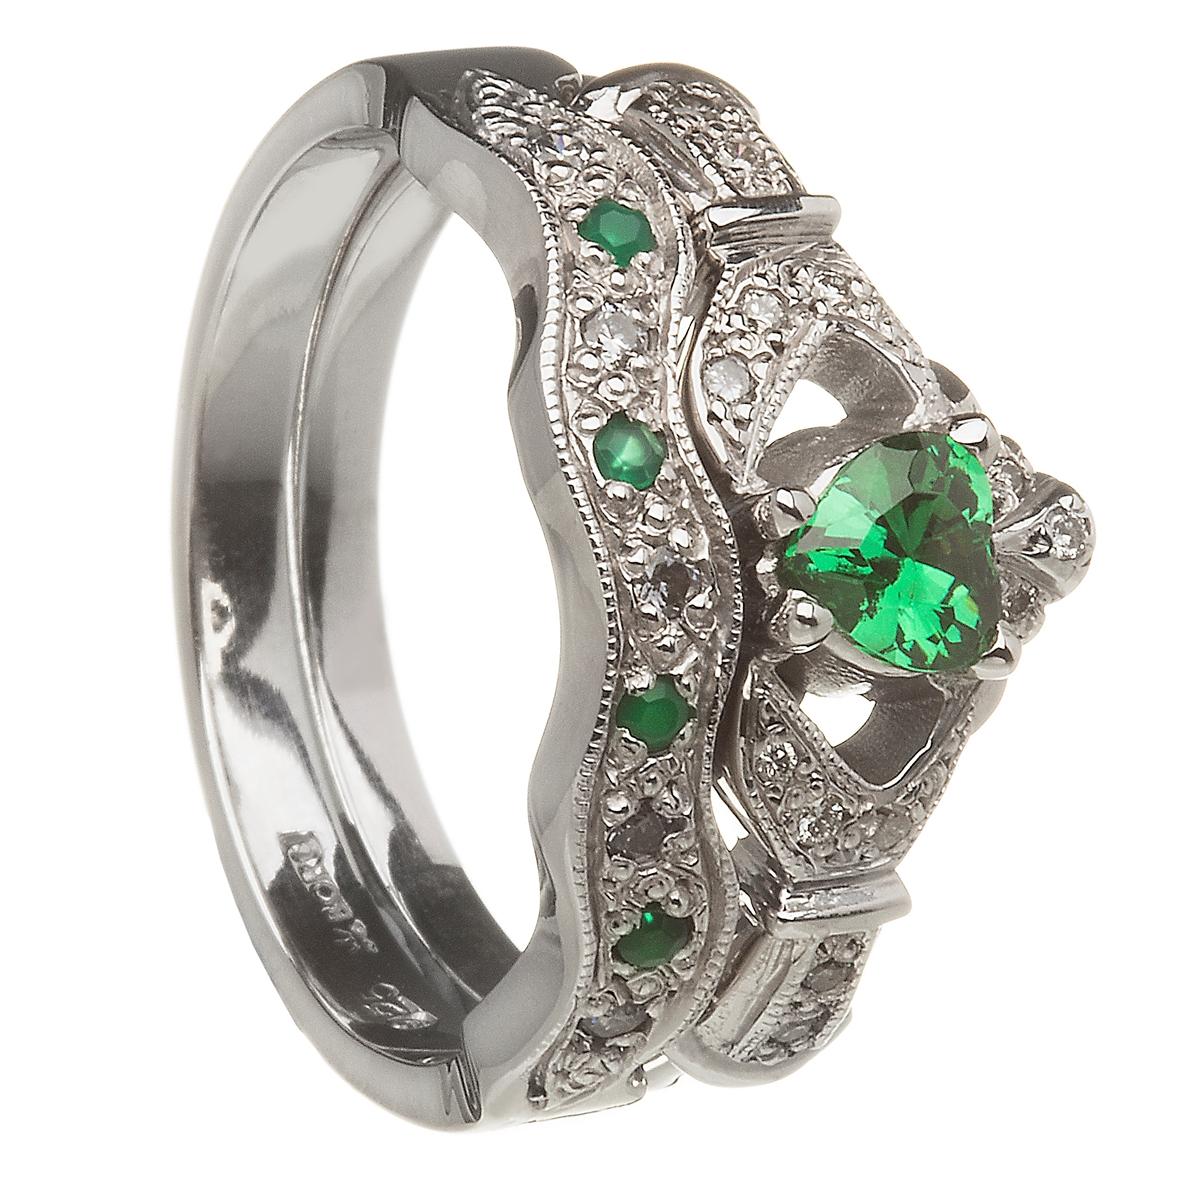 Amazing Celtic Jewelry, Irish Jewelry, Claddagh Rings   Claddaghstore